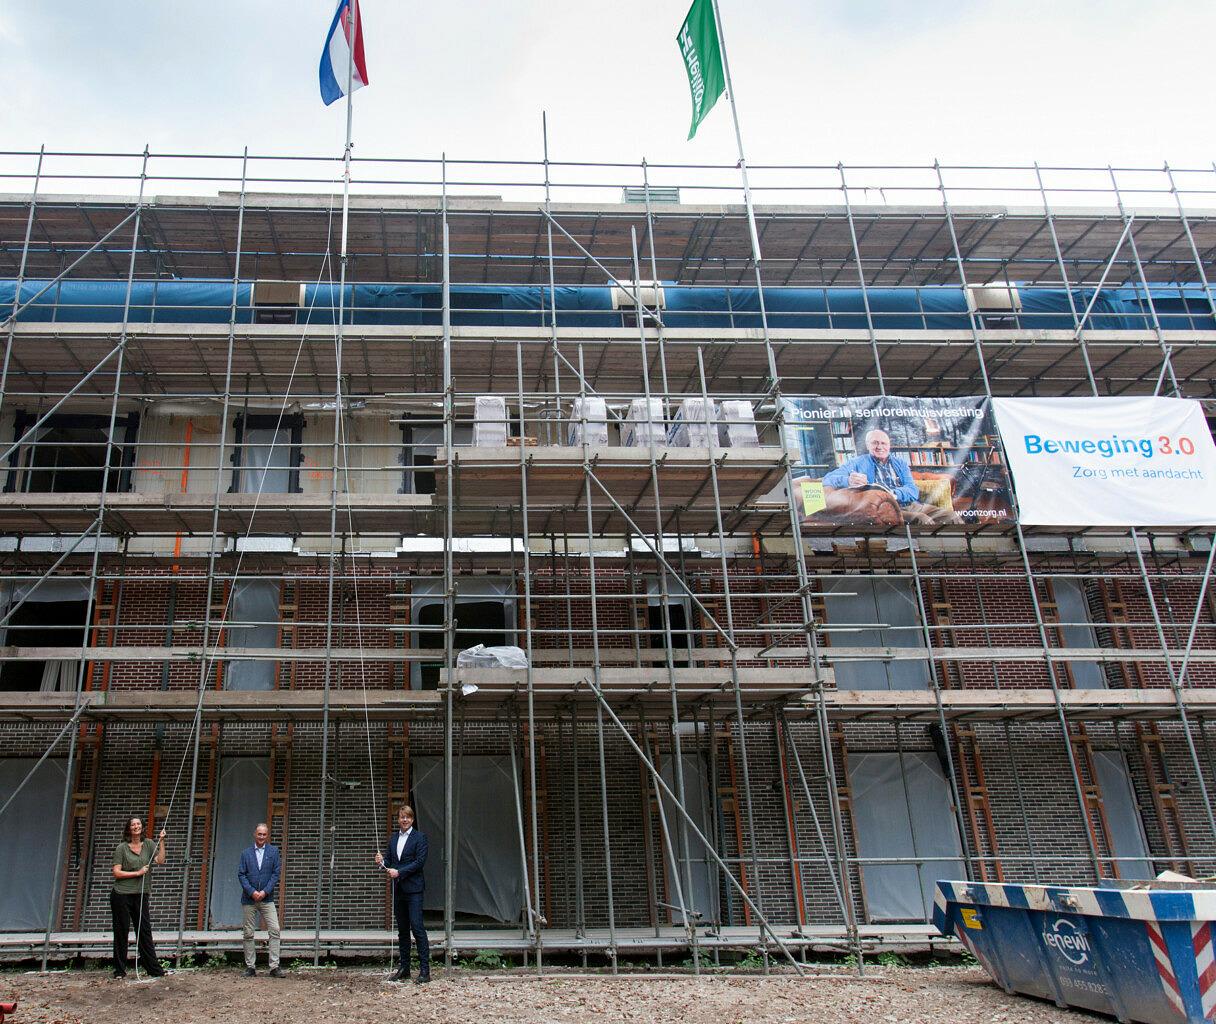 nieuwbouw verpleeghuis Marienburg Soest - hoogste punt - Beweging 3.0 Woonzorg Nederland